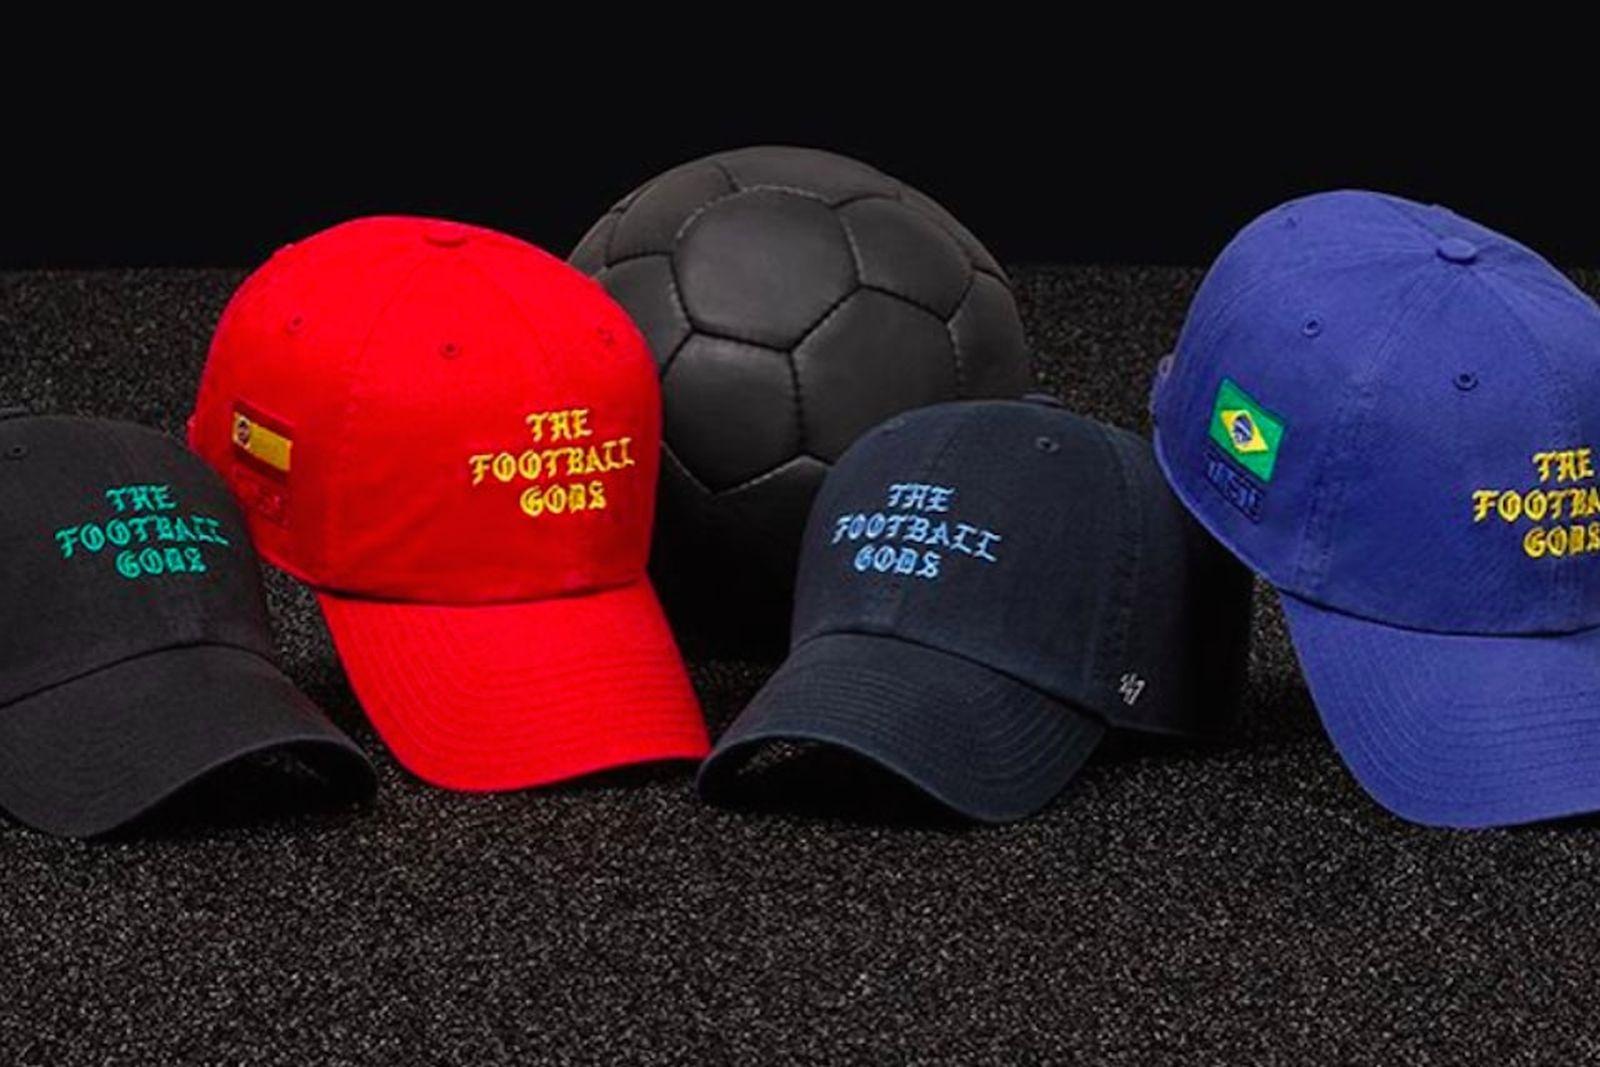 47 the football gods headwear '47 2018 FIFA World Cup